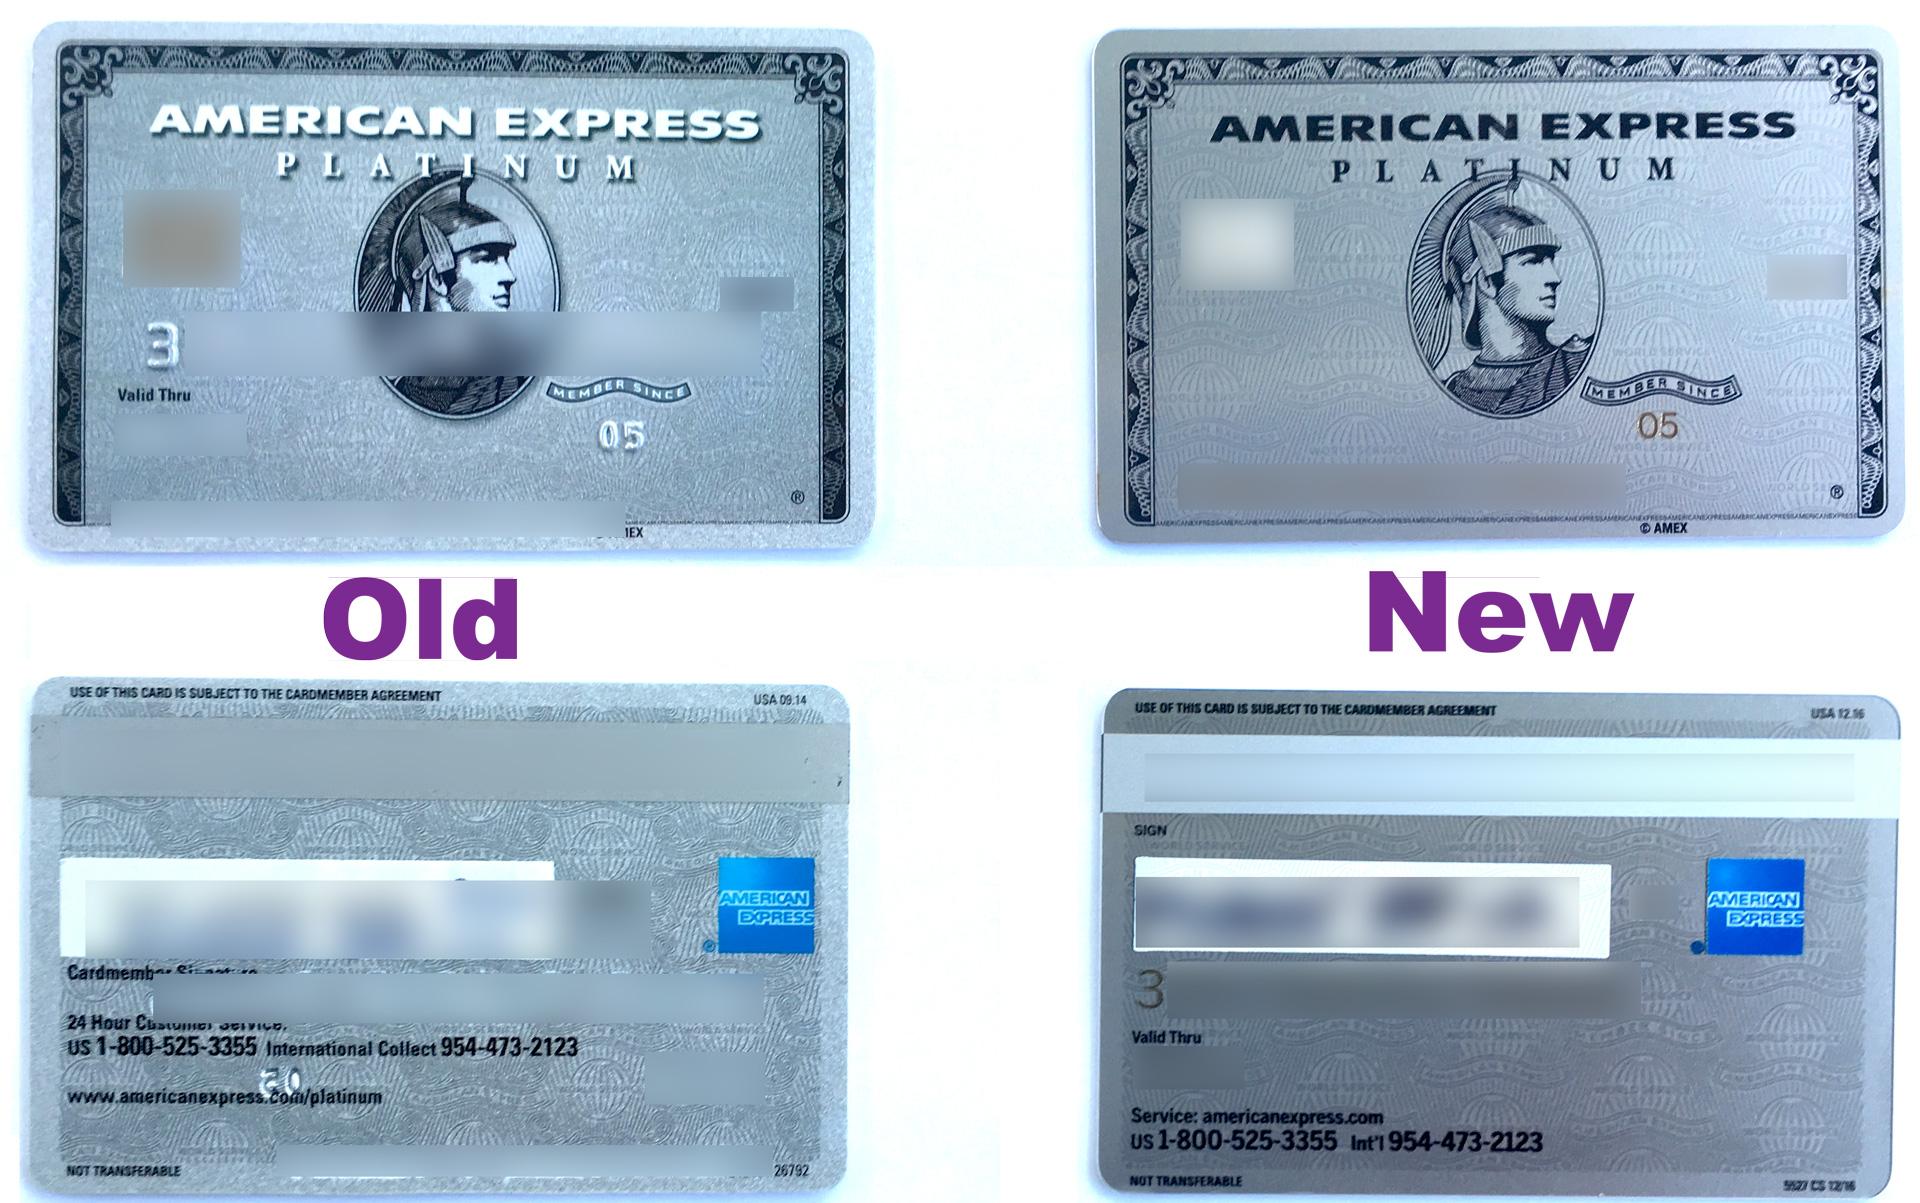 American Express Platinum Card Comparison Gemescool Org